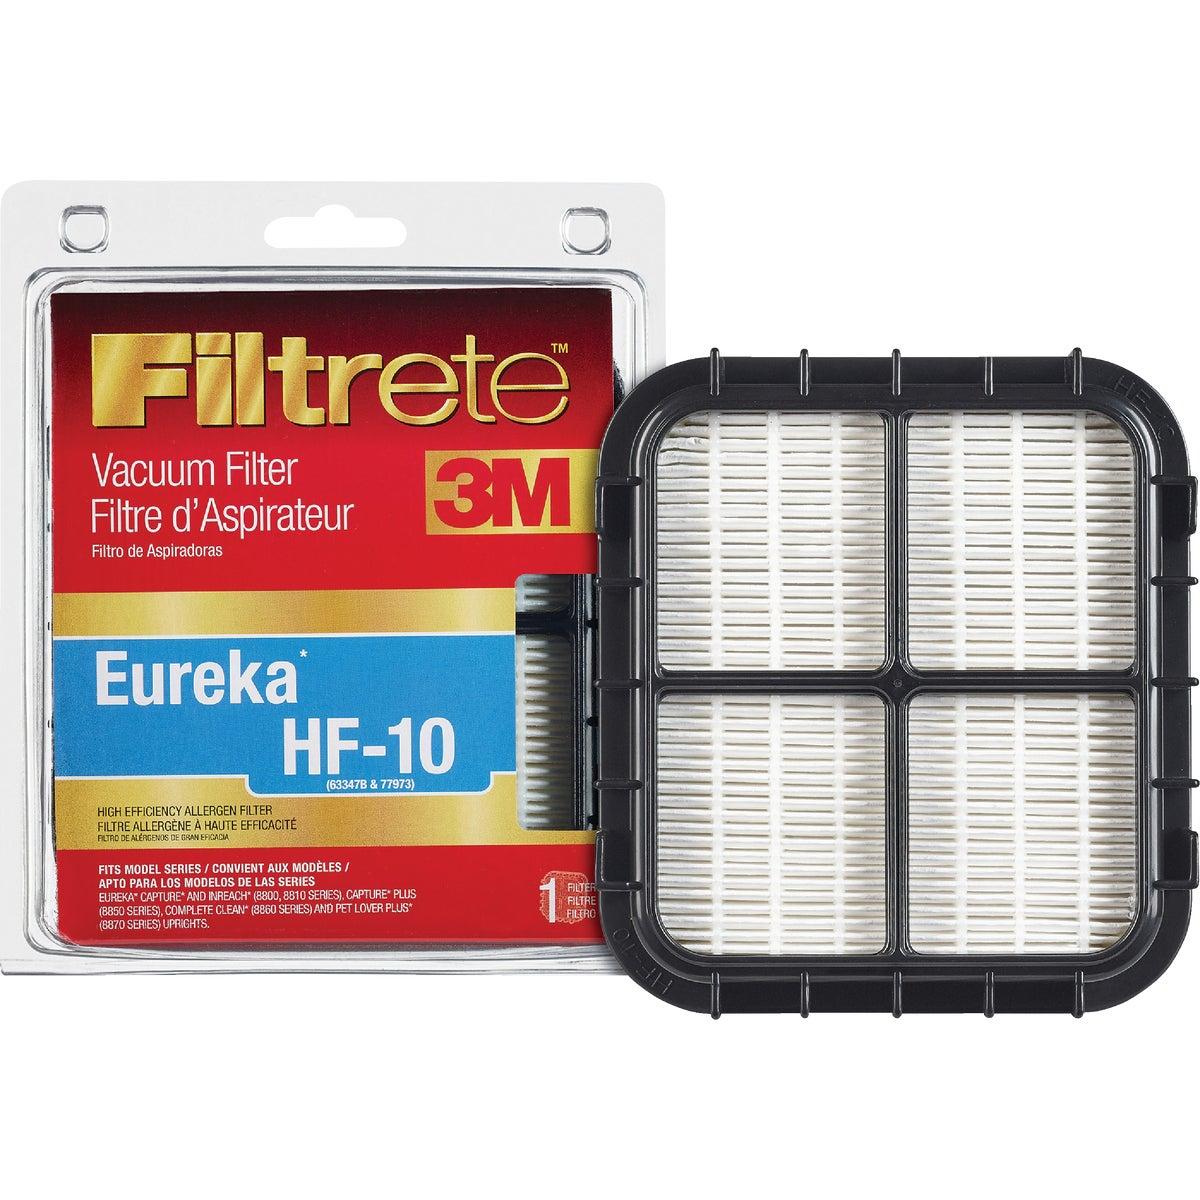 EUREKA HF10 HEPA FILTER